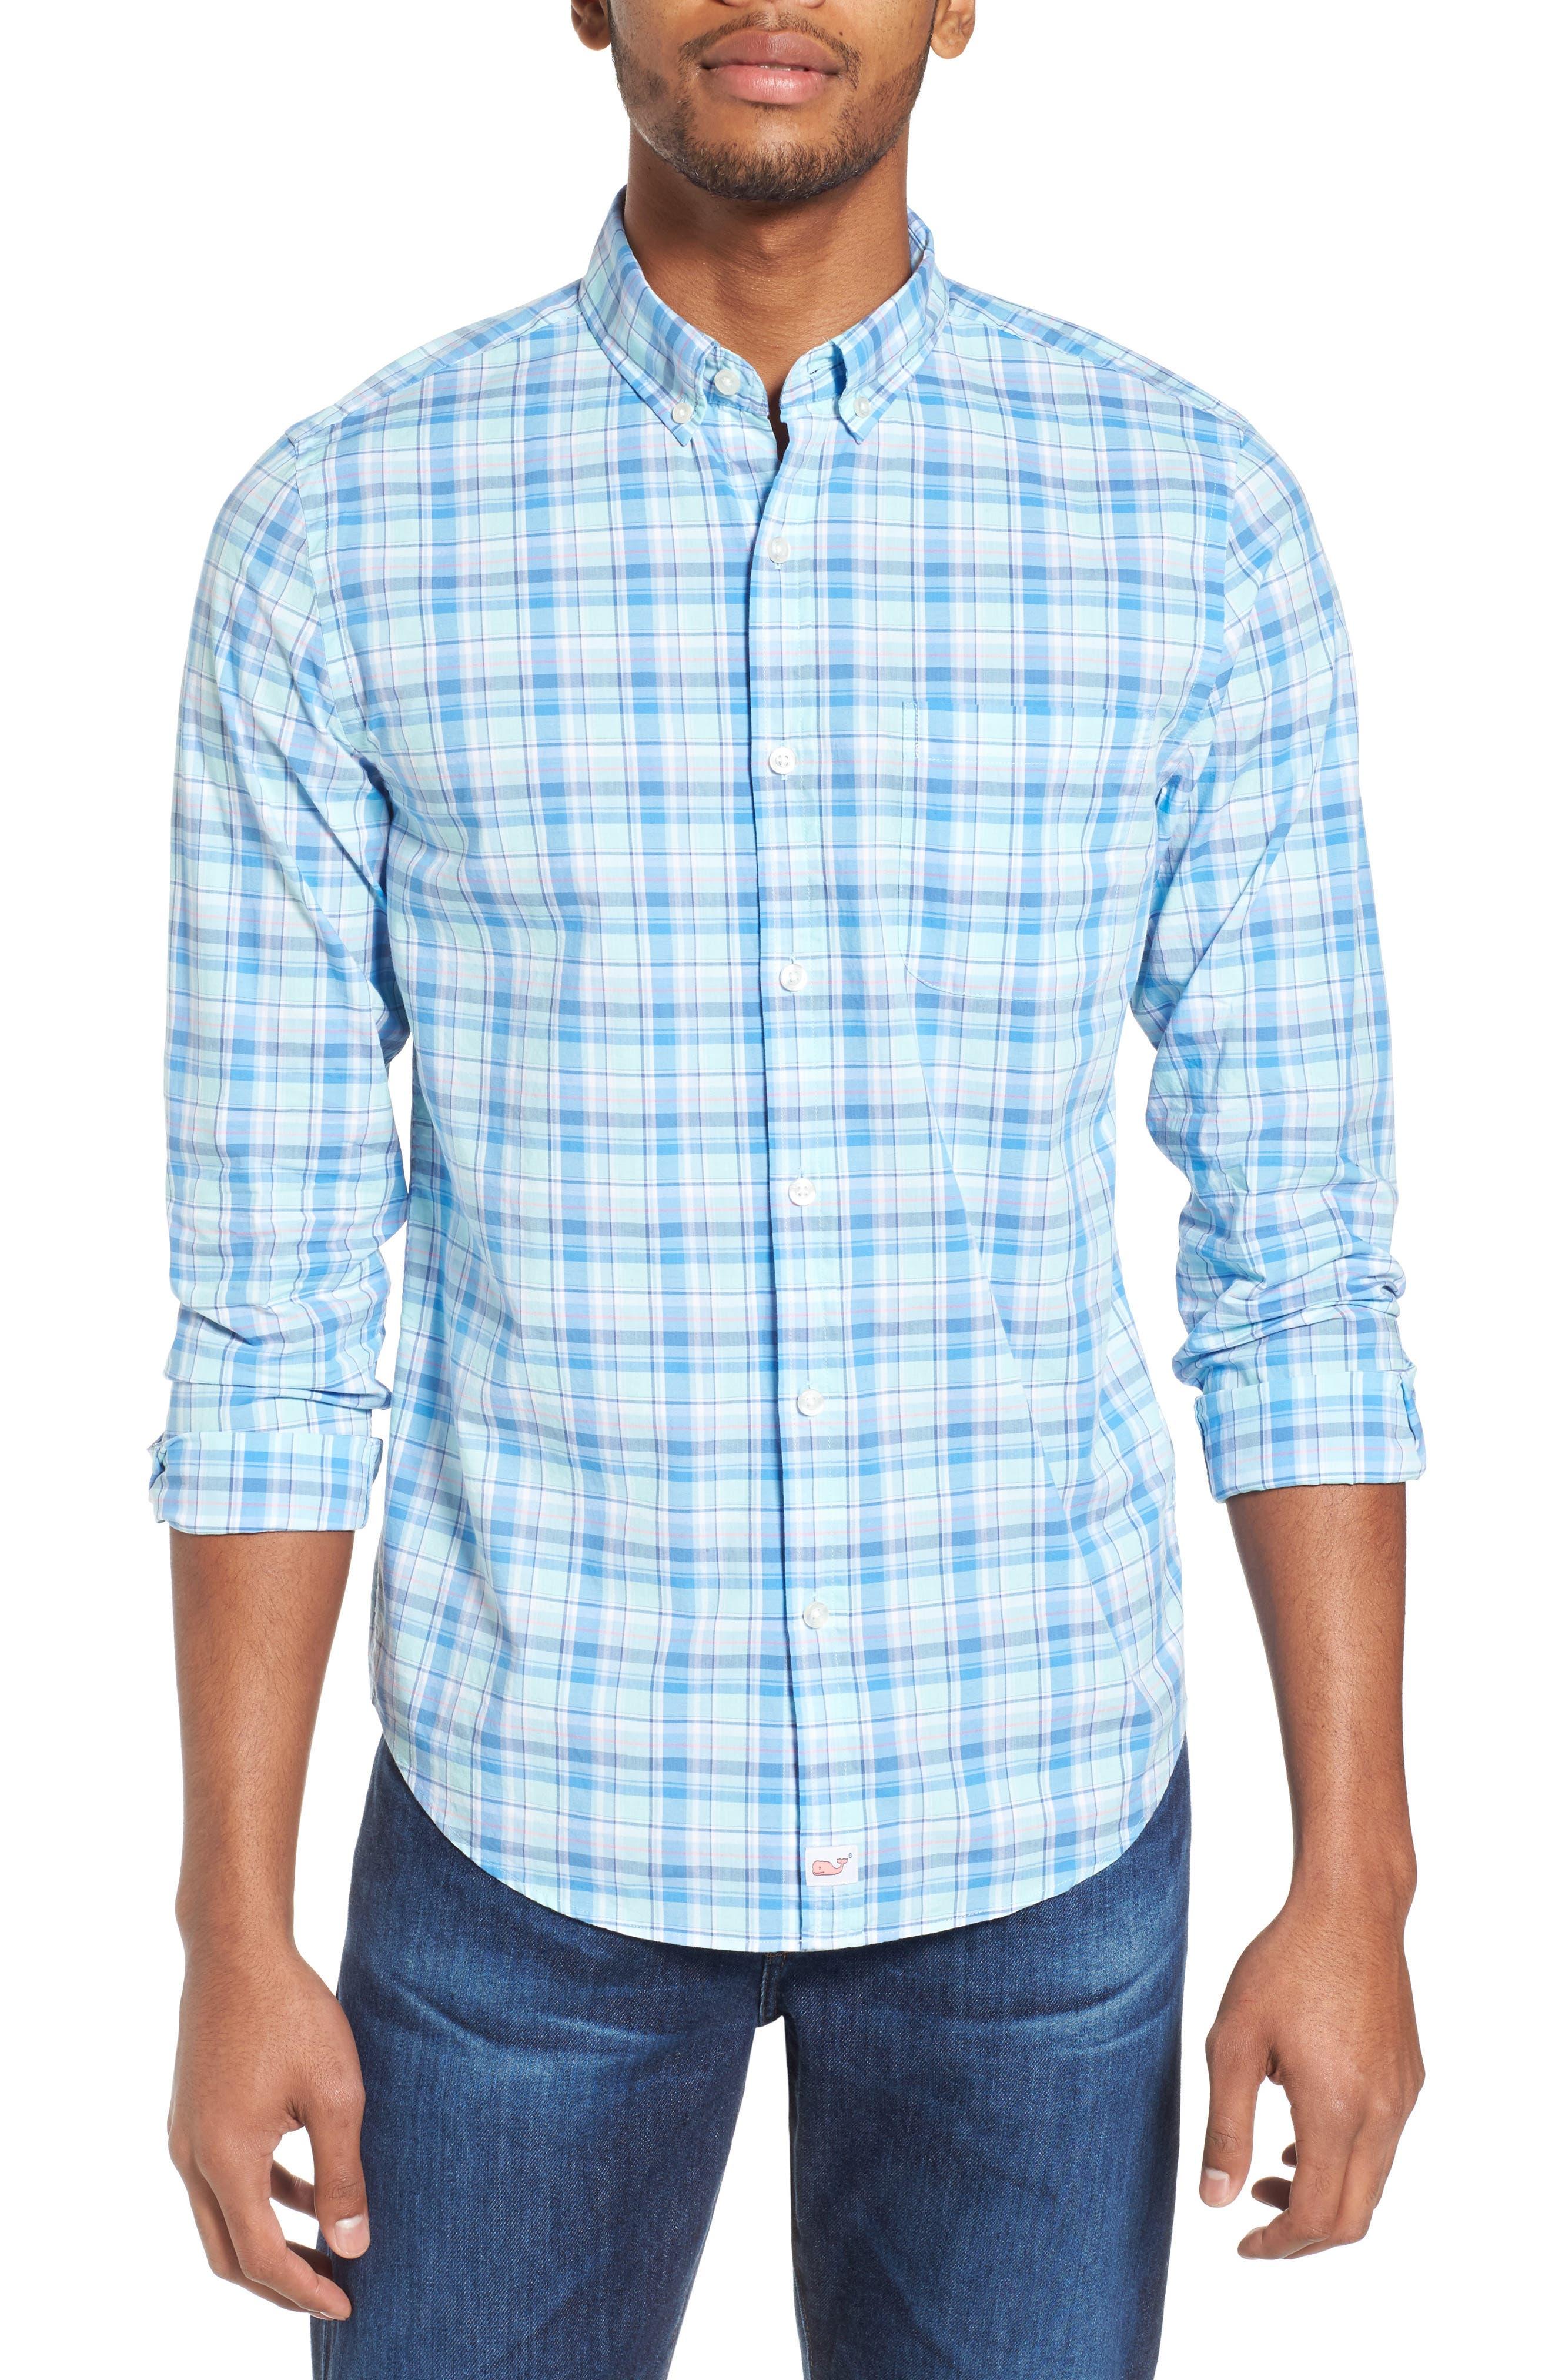 Murray Pine Island Slim Fit Plaid Sport Shirt,                         Main,                         color, 422